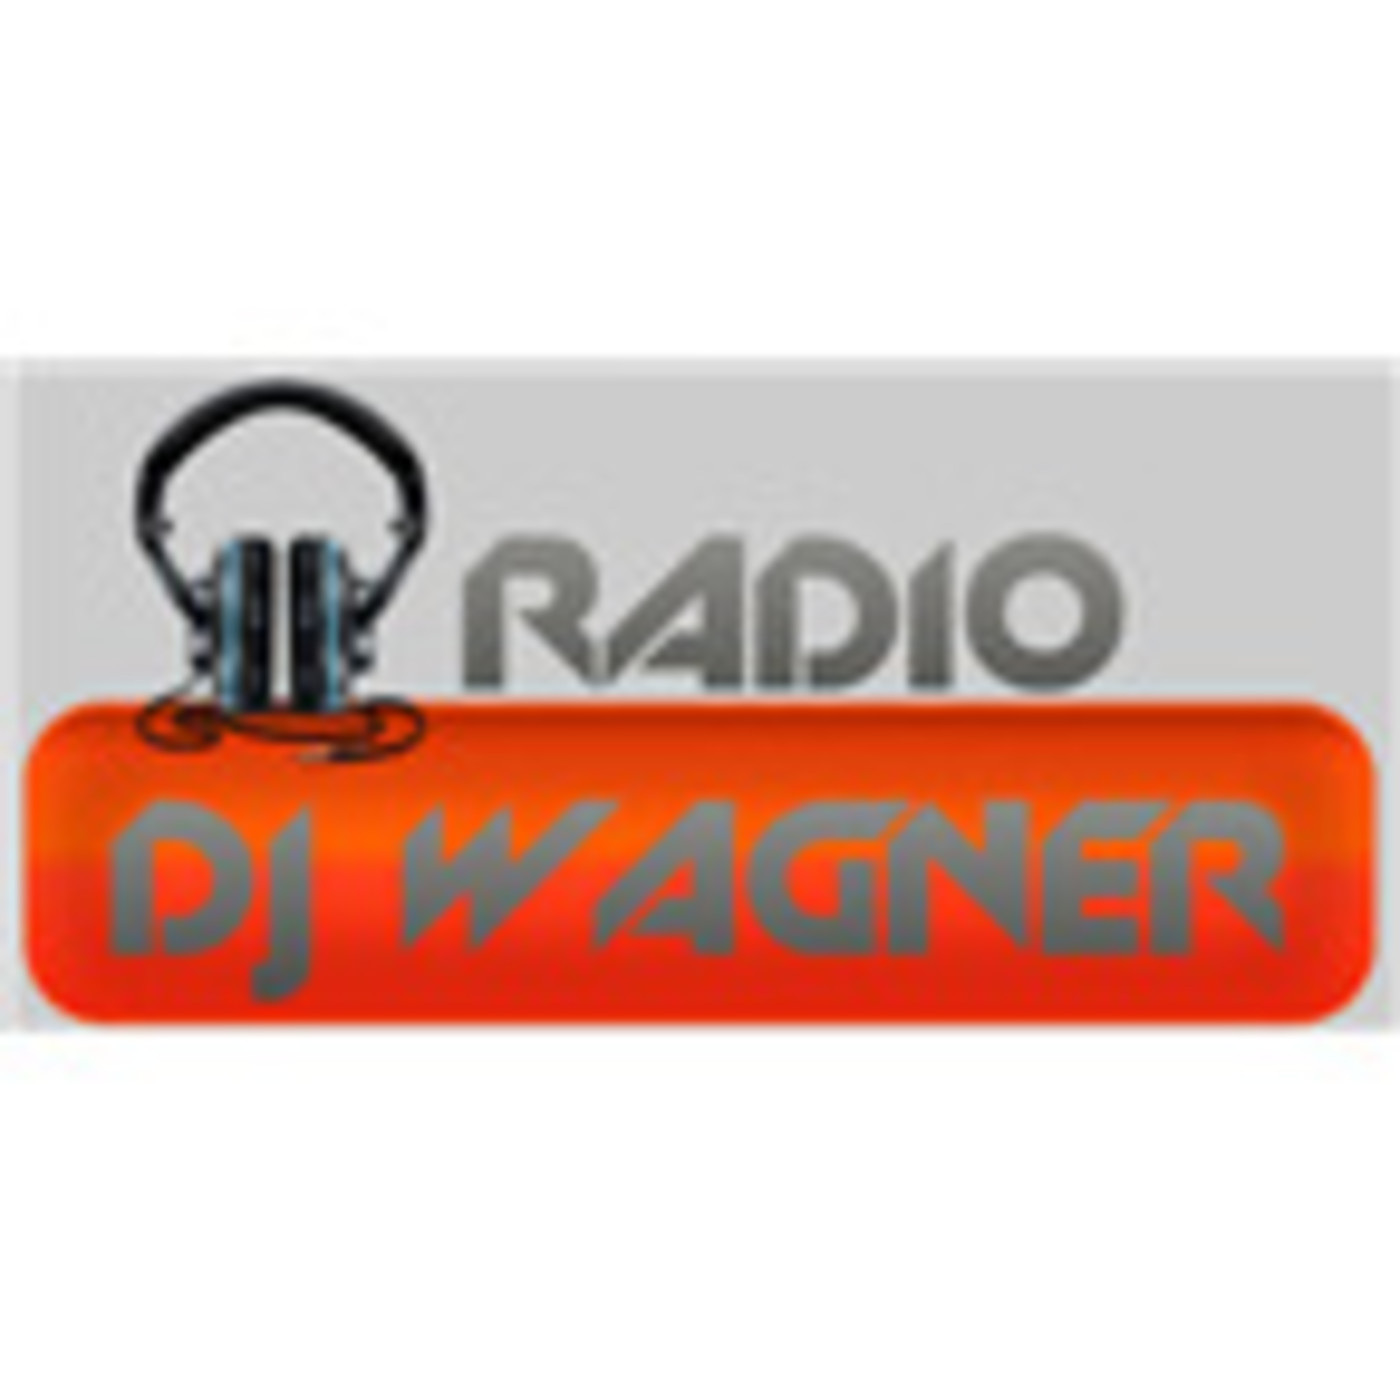 Radio Dj Wagner